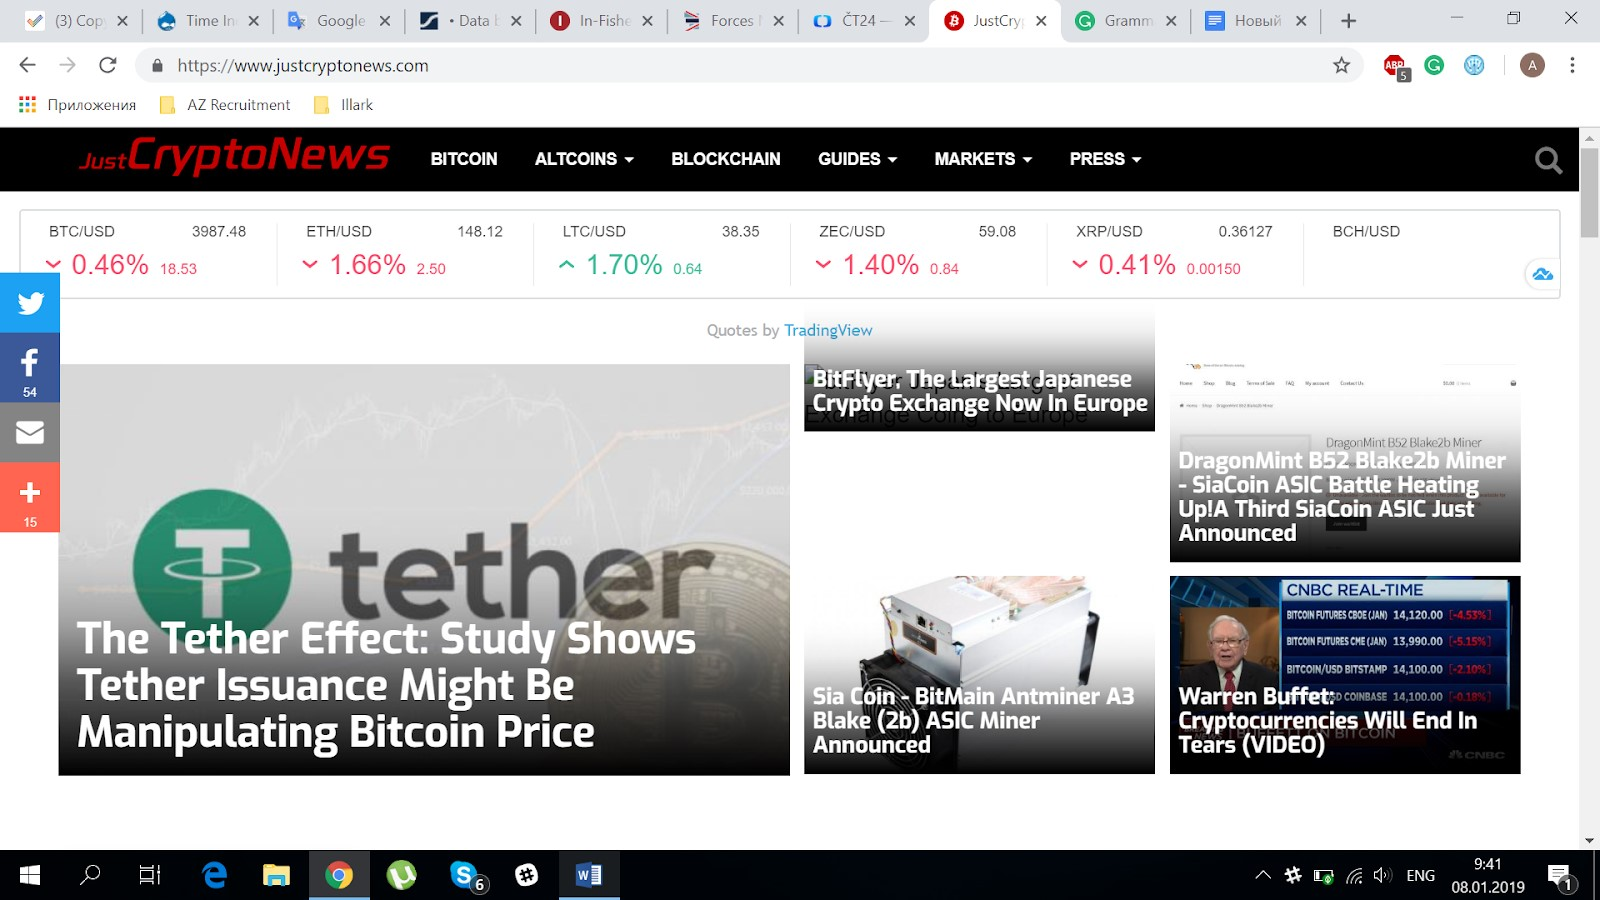 crypto_news_website